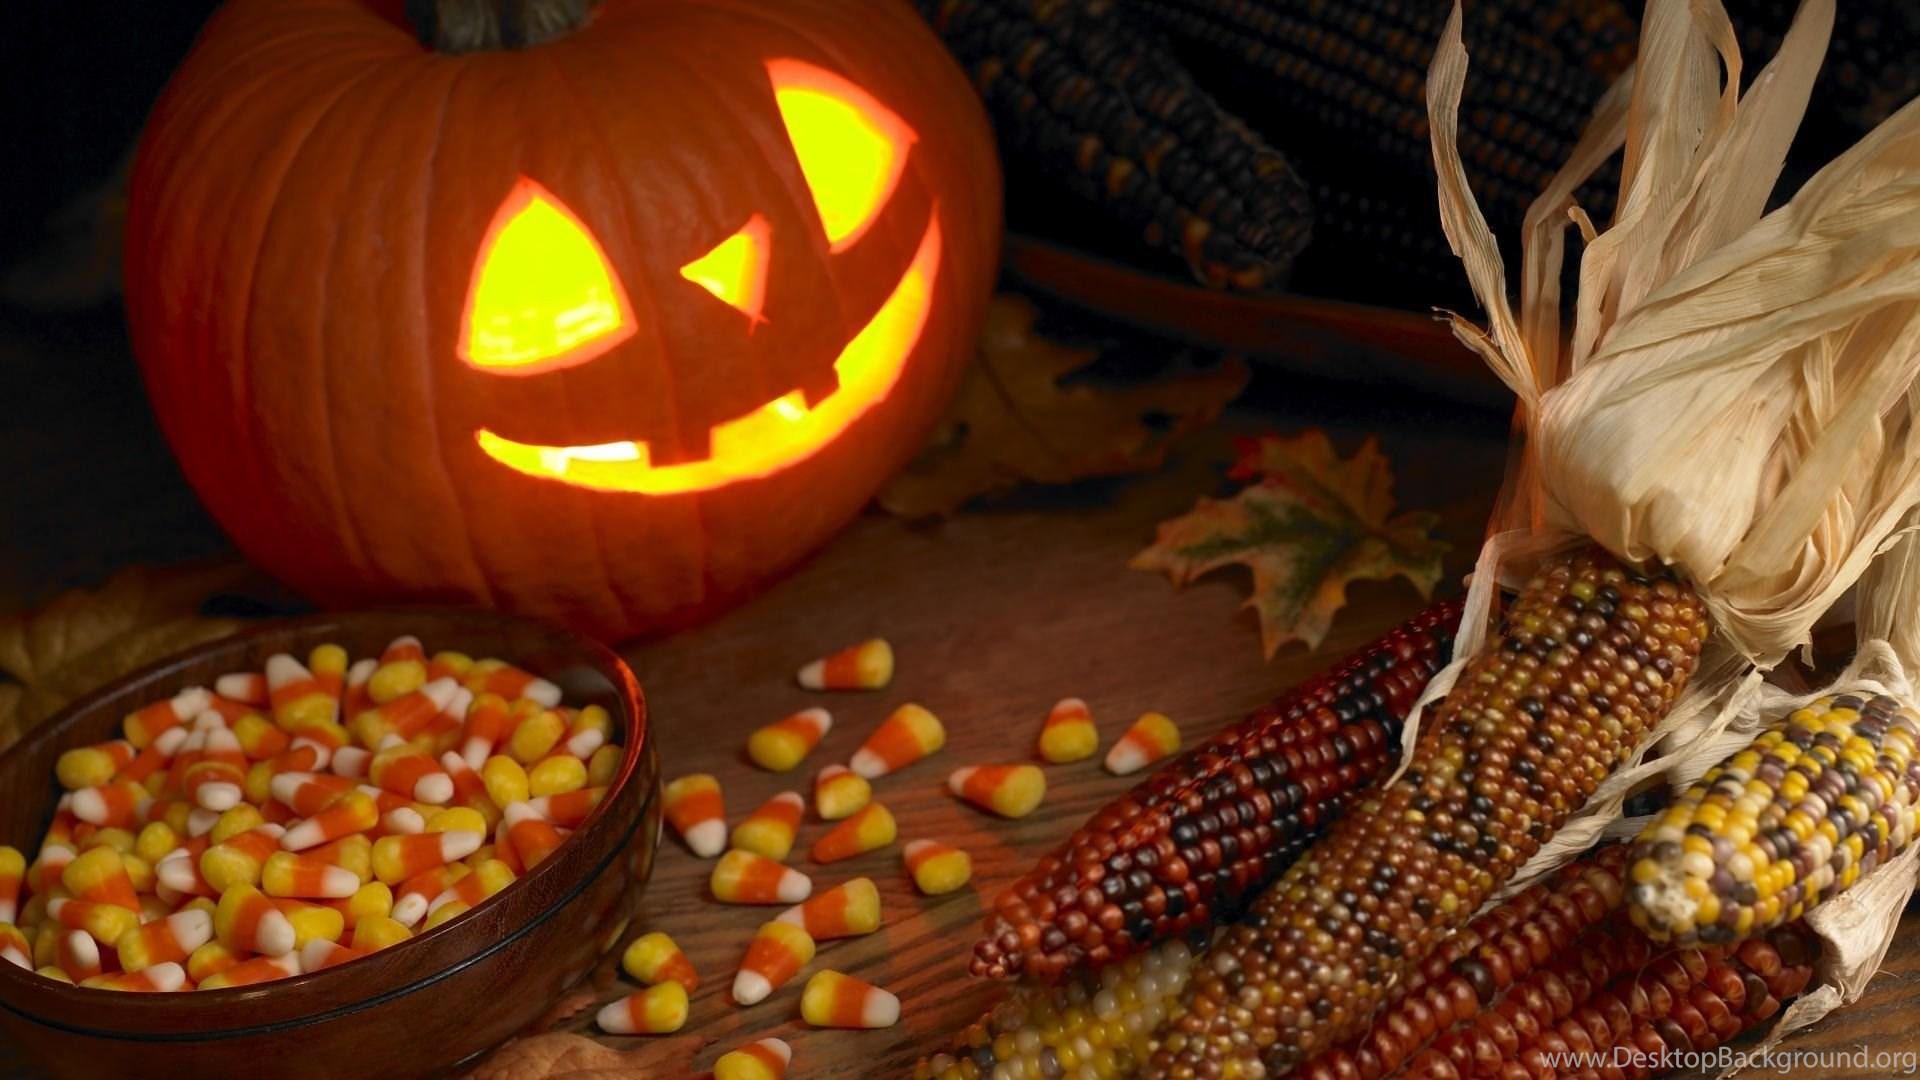 Photo Of Jack O Latern Pumpkin Indian Corn Candy Corn And